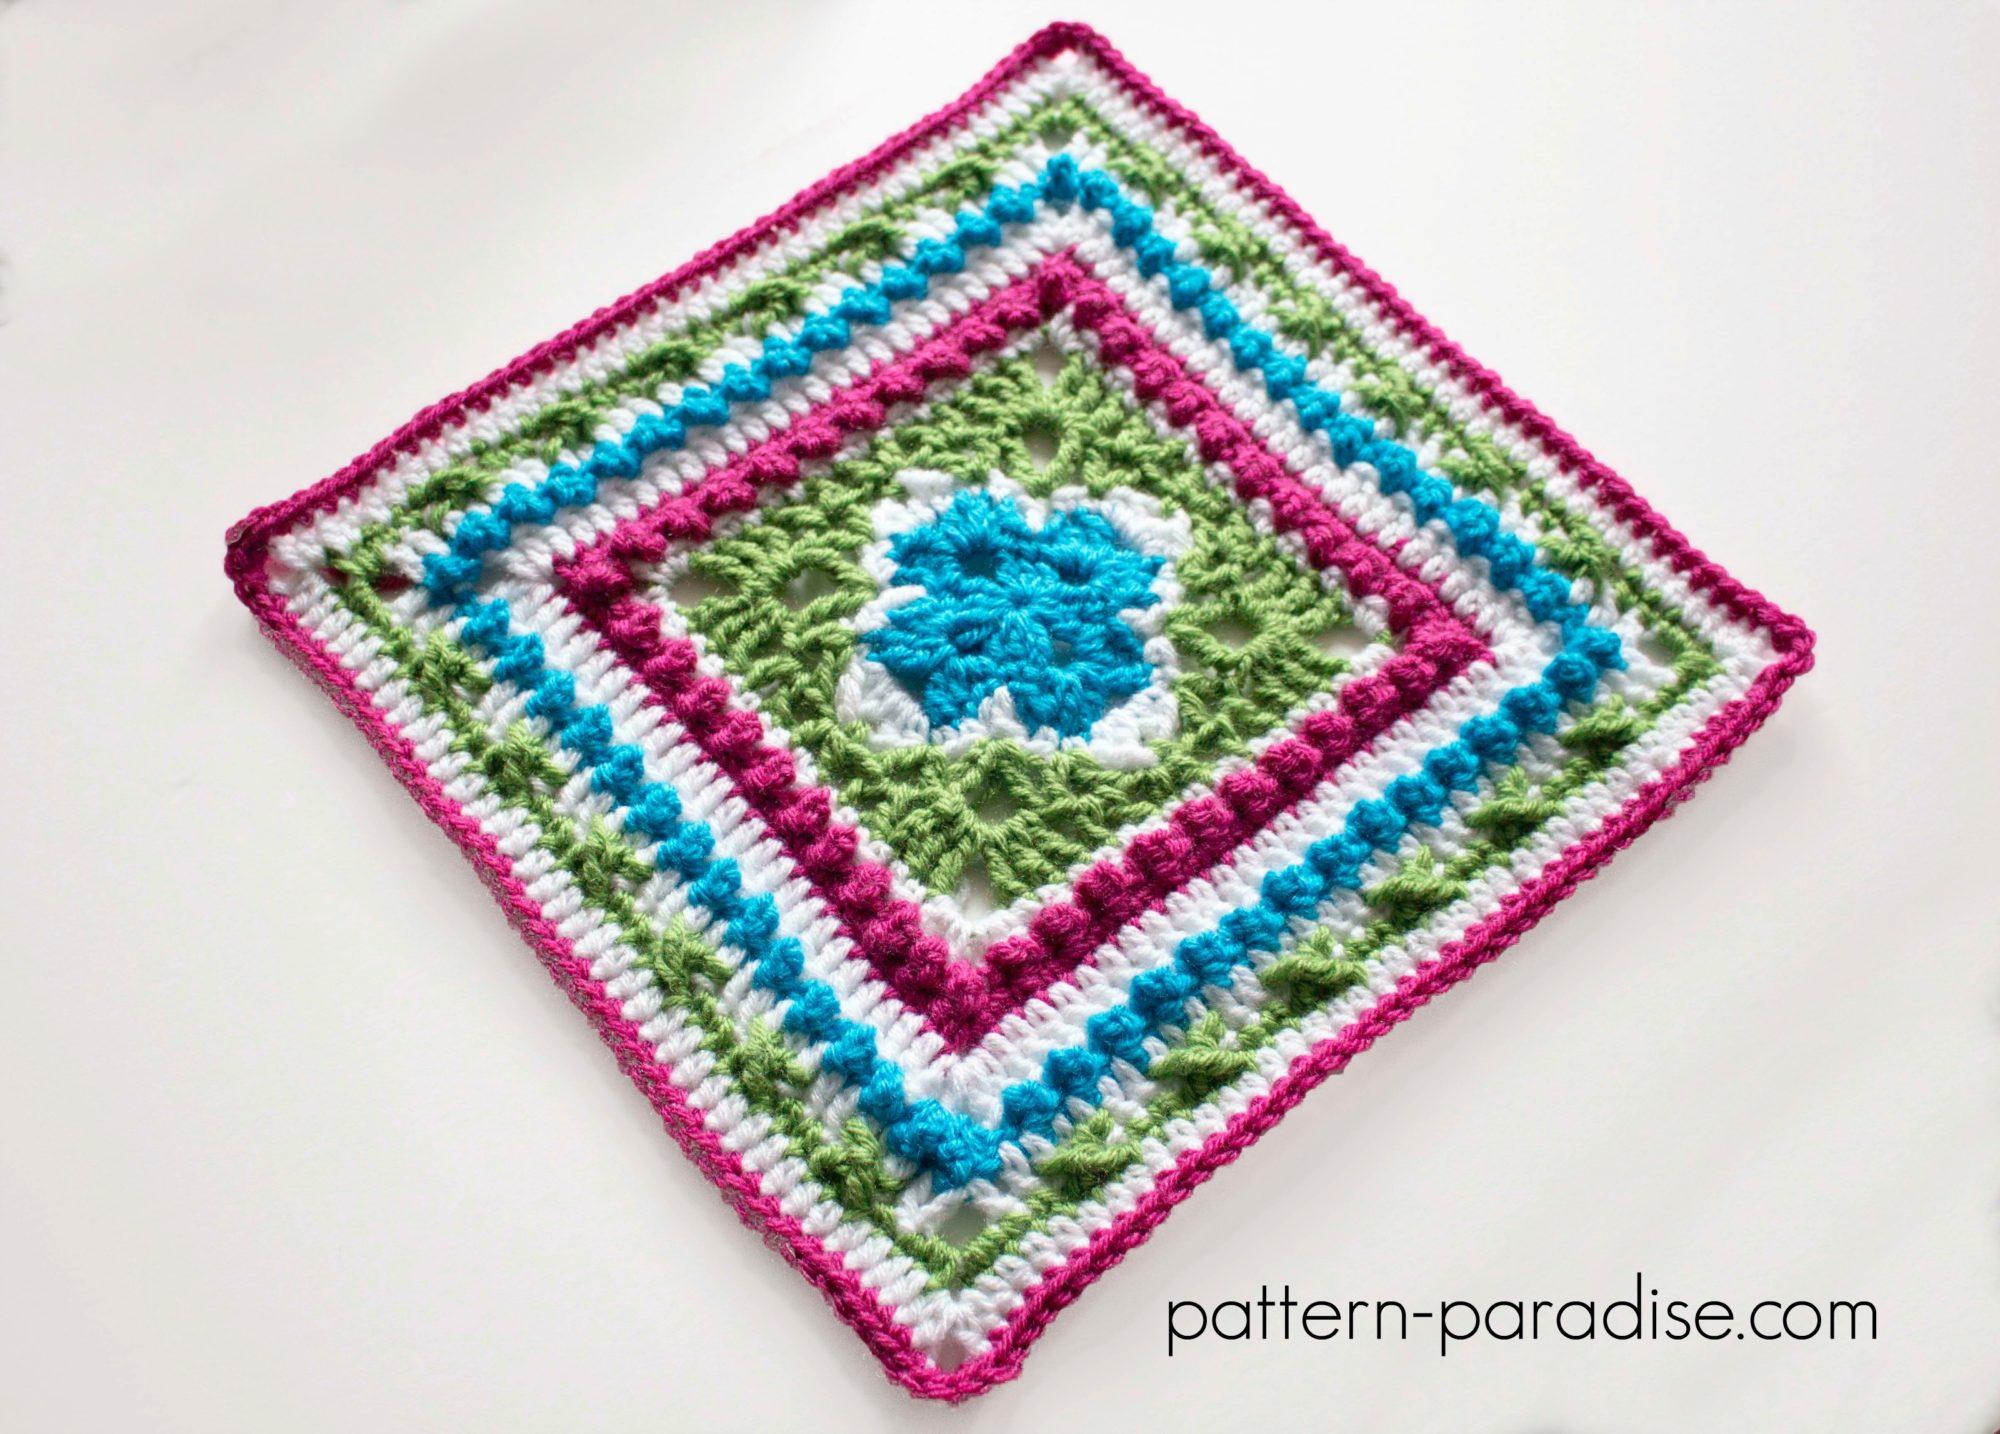 Free Crochet Pattern English Garden Square by Pattern-Paradise.com